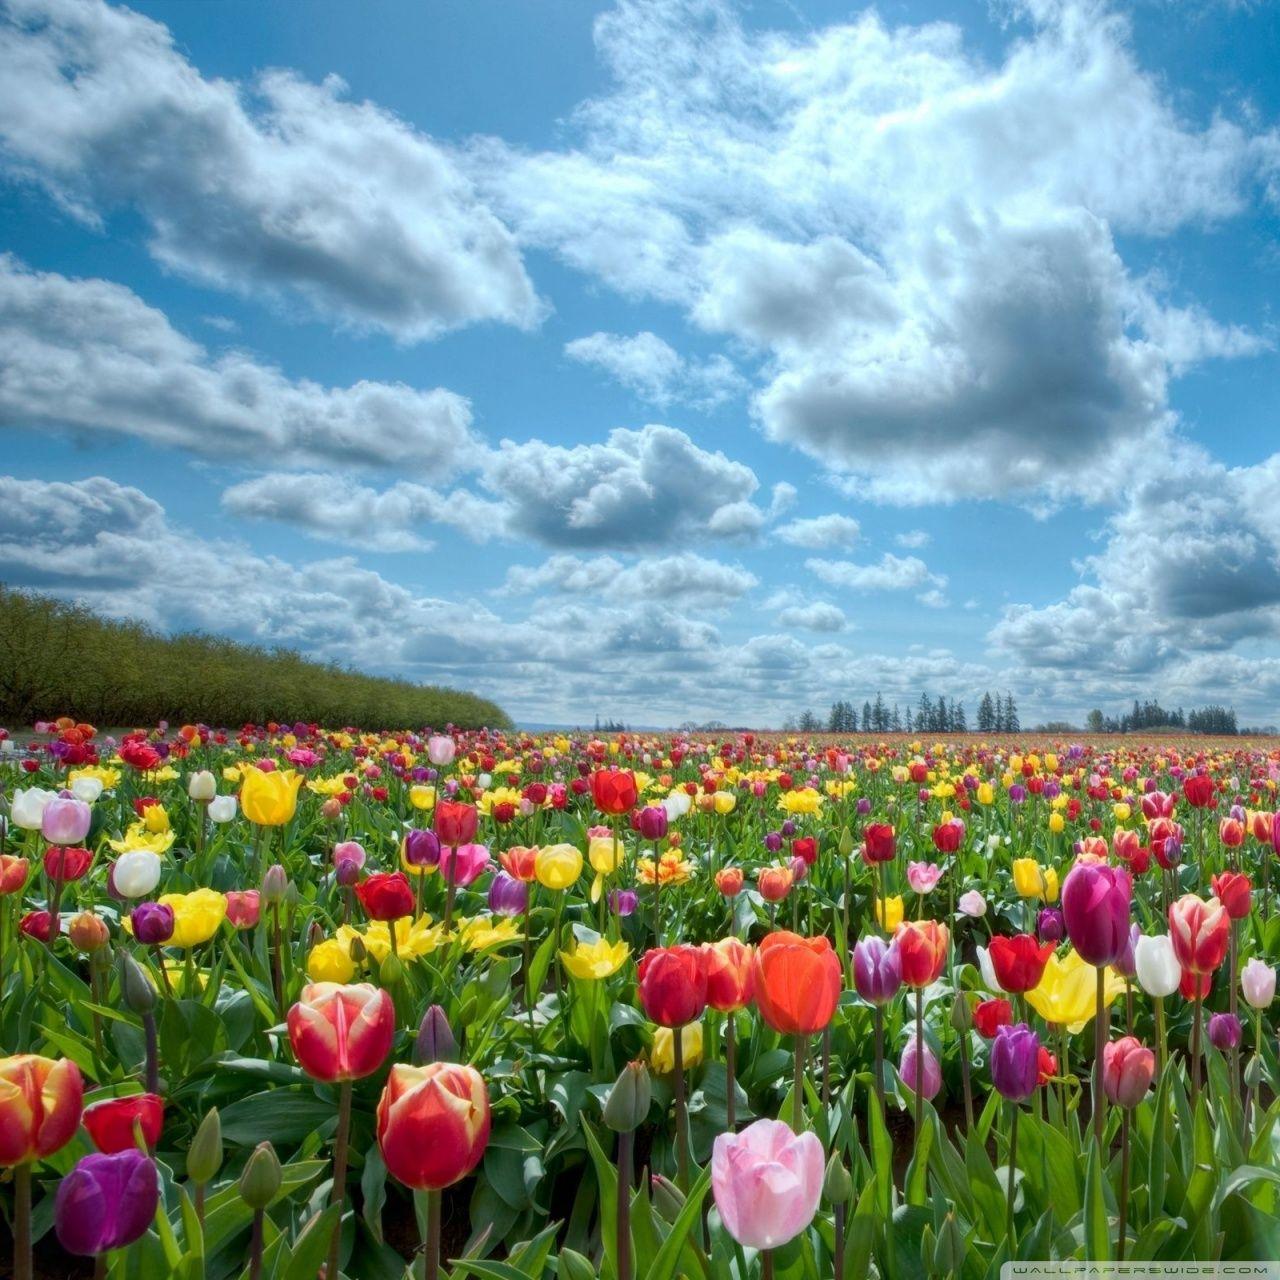 Vast Tulips Field Beautiful Flowers Wallpapers Field Wallpaper Flower Field